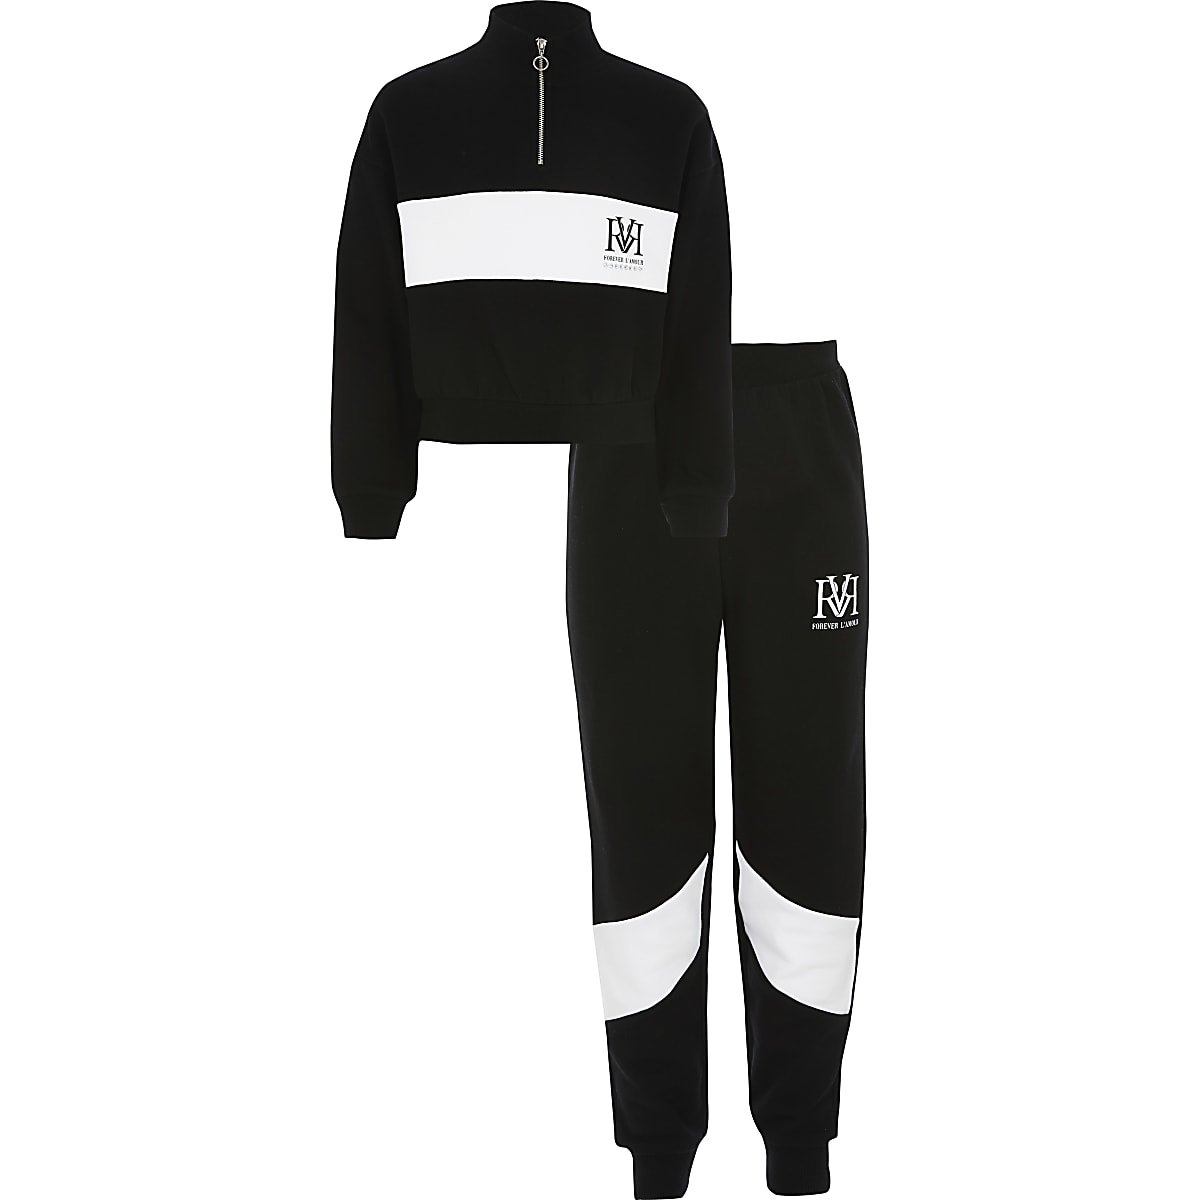 Girls black RVR blocked sweatshirt outfit